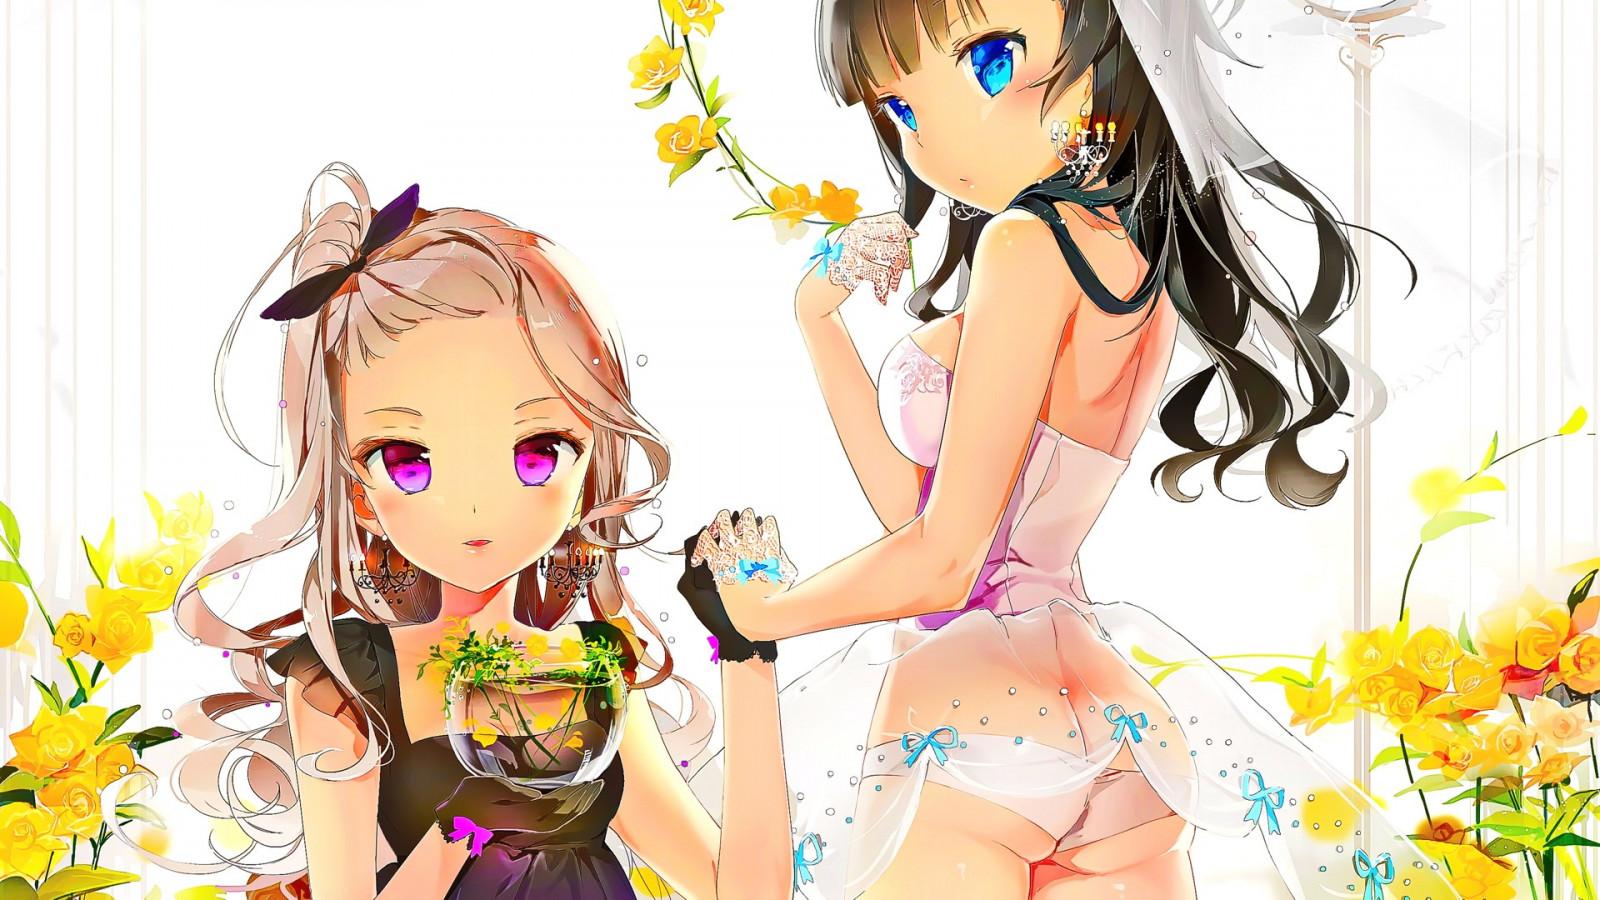 Wallpaper : illustration, blonde, anime girls, open mouth